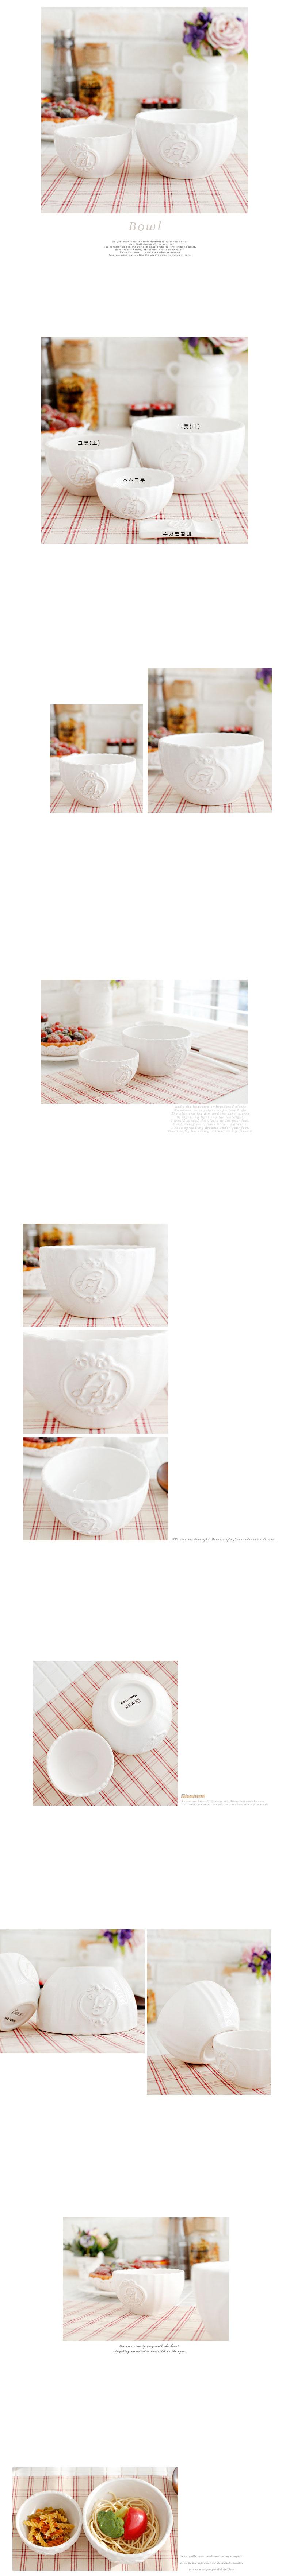 LA 화이트 그릇(2size) - 꾸미기 좋은날, 8,000원, 밥공기/국공기, 밥공기